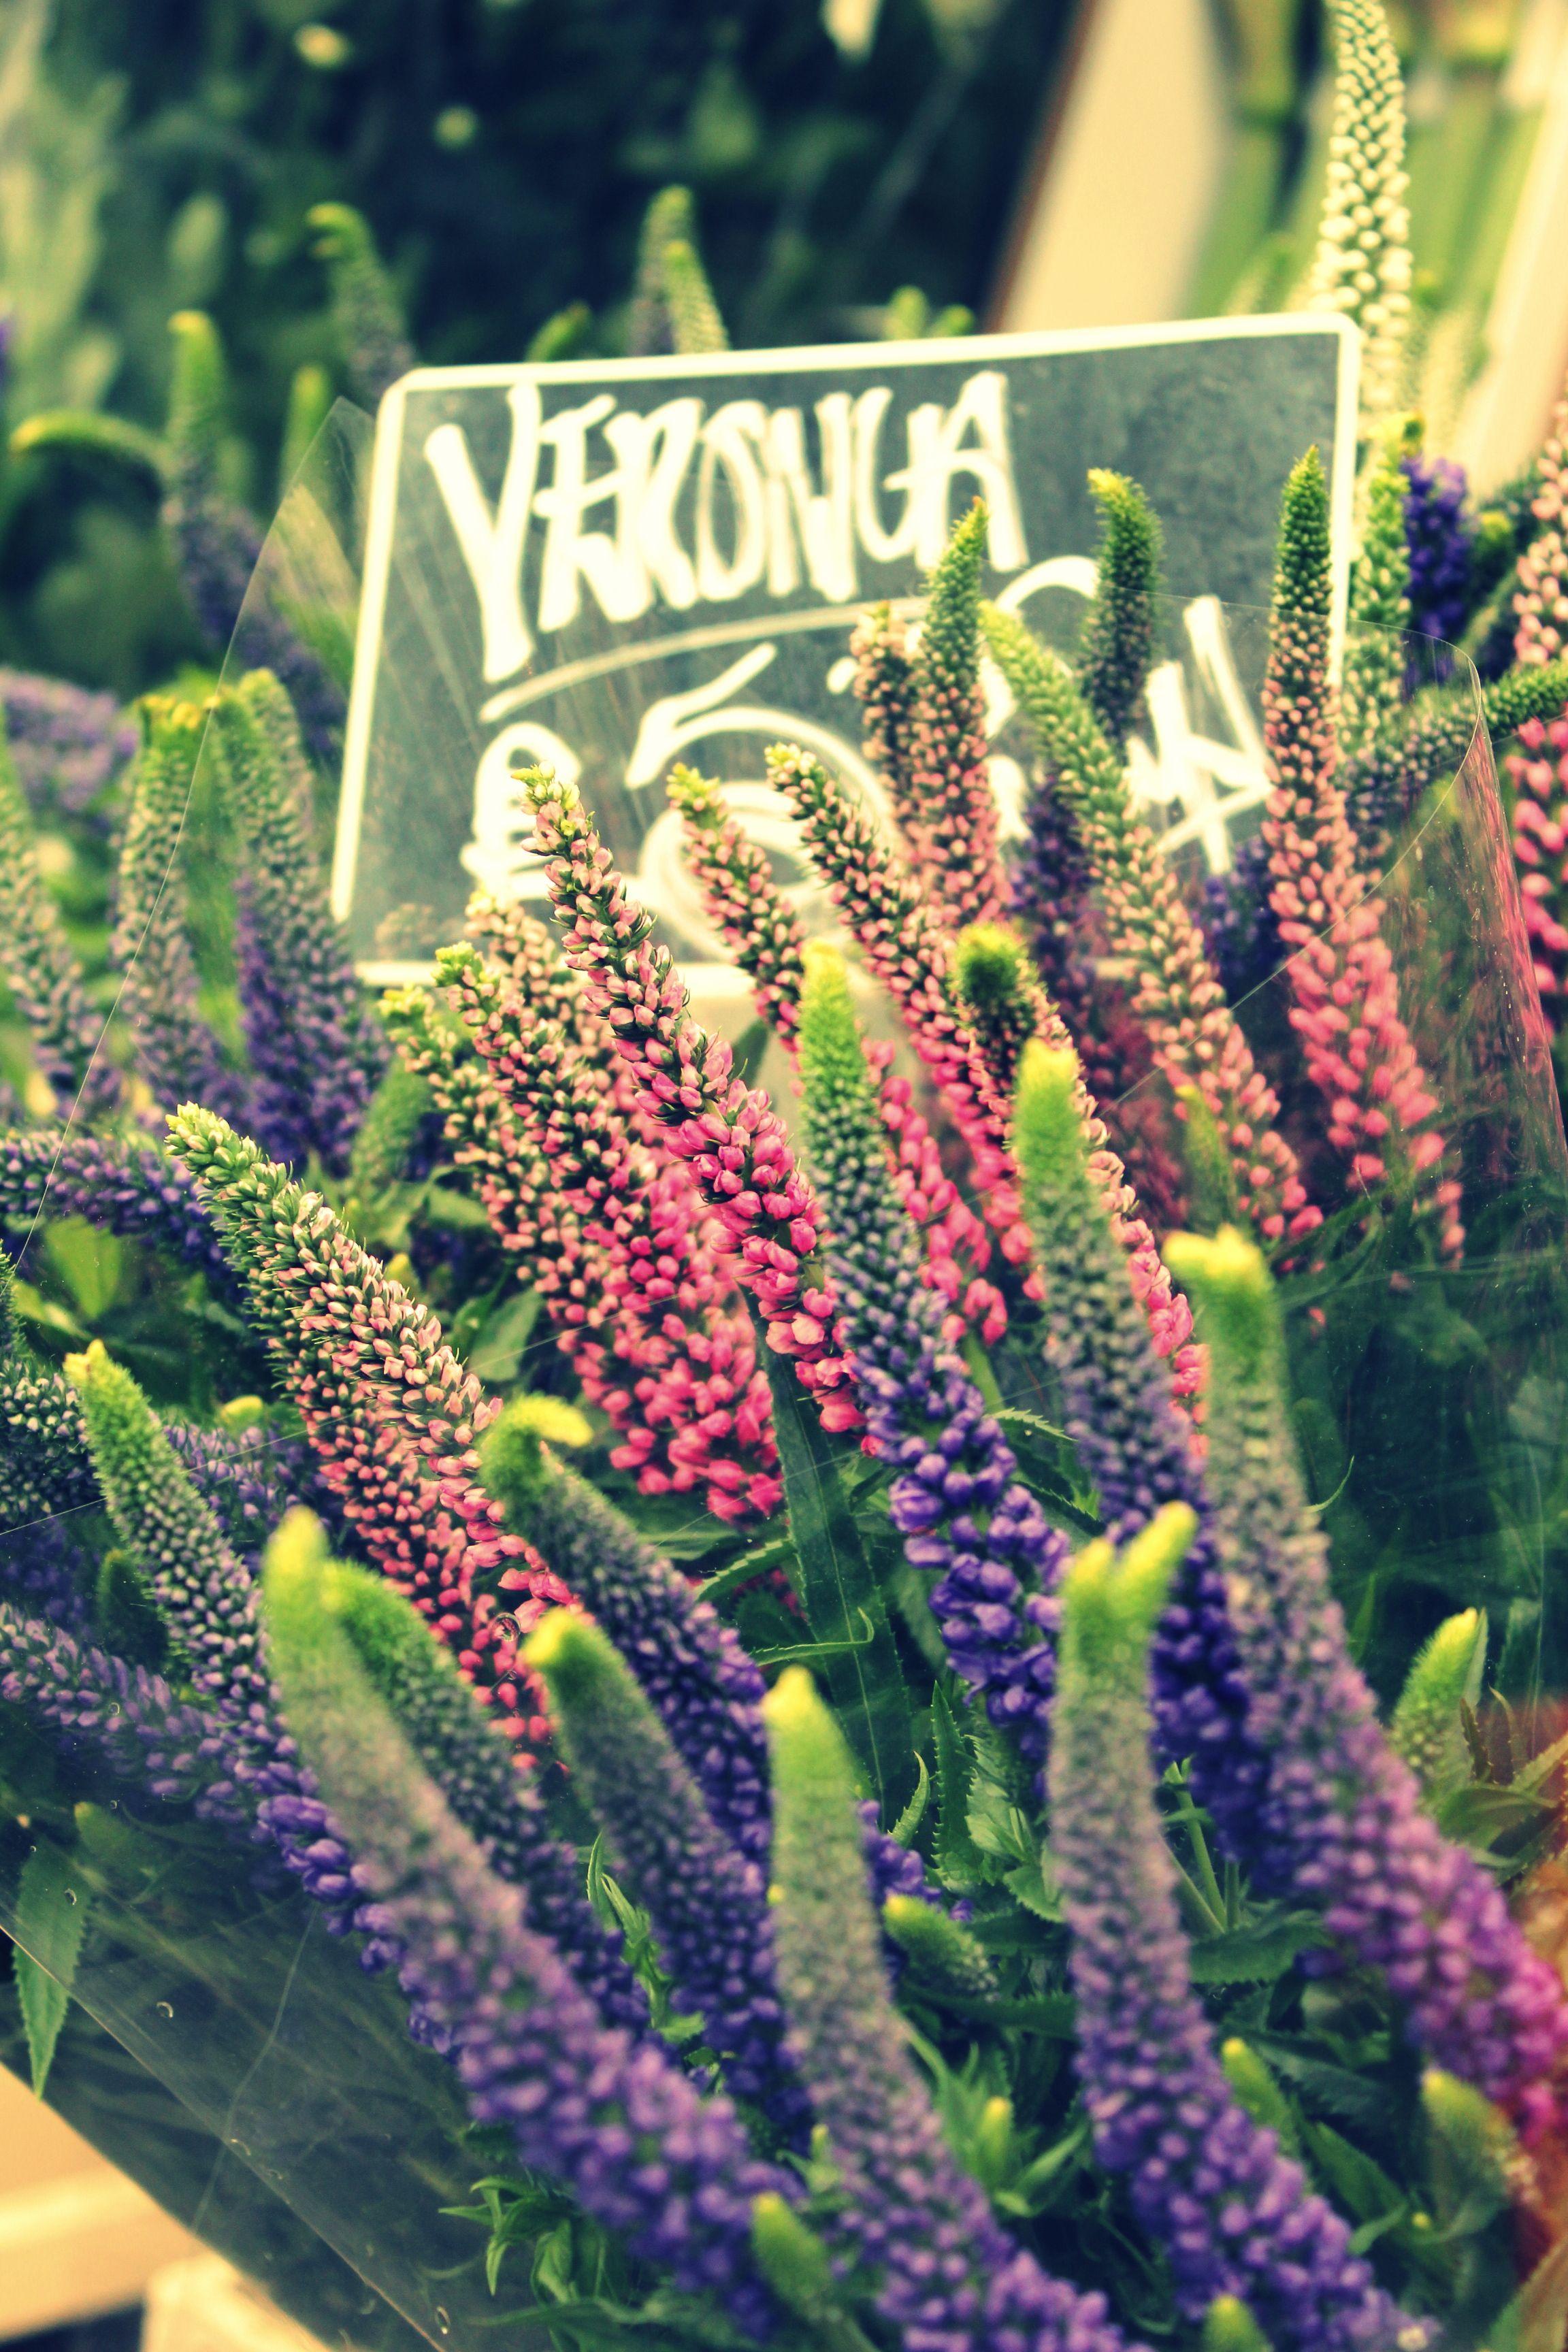 Veronica Flower - Columbia Road Flower Market, London http://martkiee.com/columbia-road-flower-market/